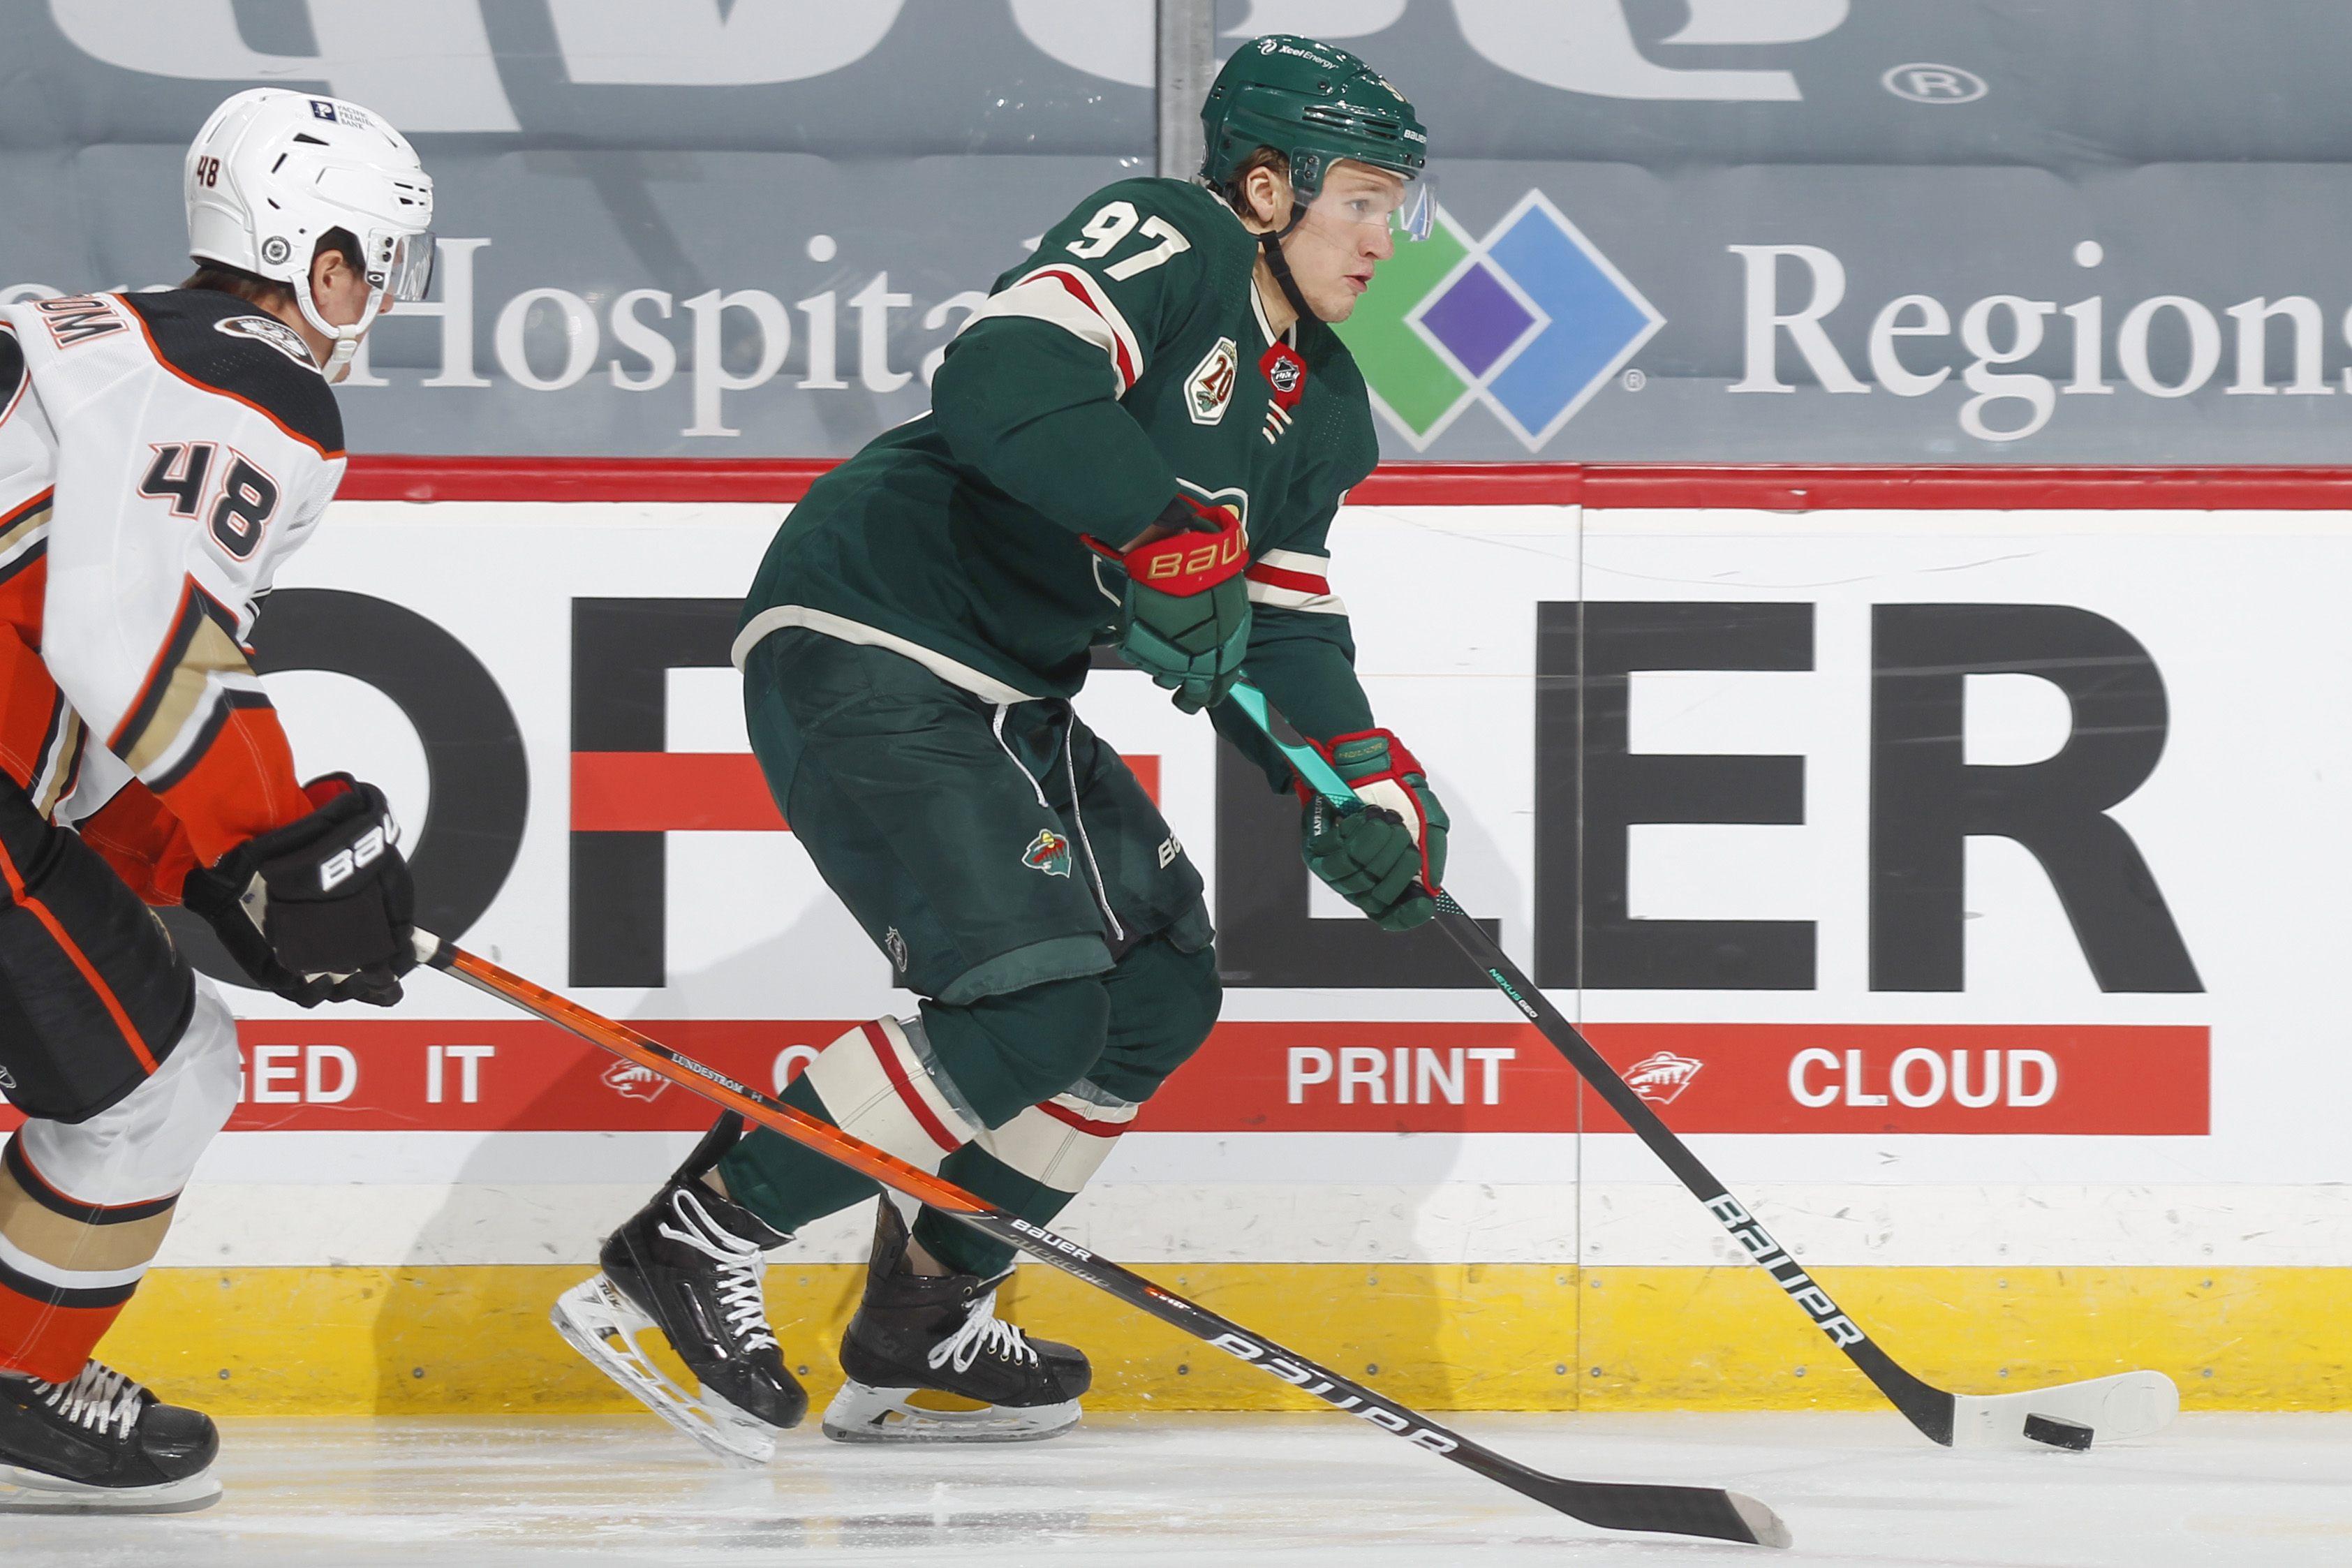 Kirill Kaprizov在明尼苏达州的野生冰球排名第97,而Anaheim Ducks在Minnesota的Saint Paul 8月8日的Xcel Energy Center的比赛中捍卫了Anaheim鸭子的第48名。